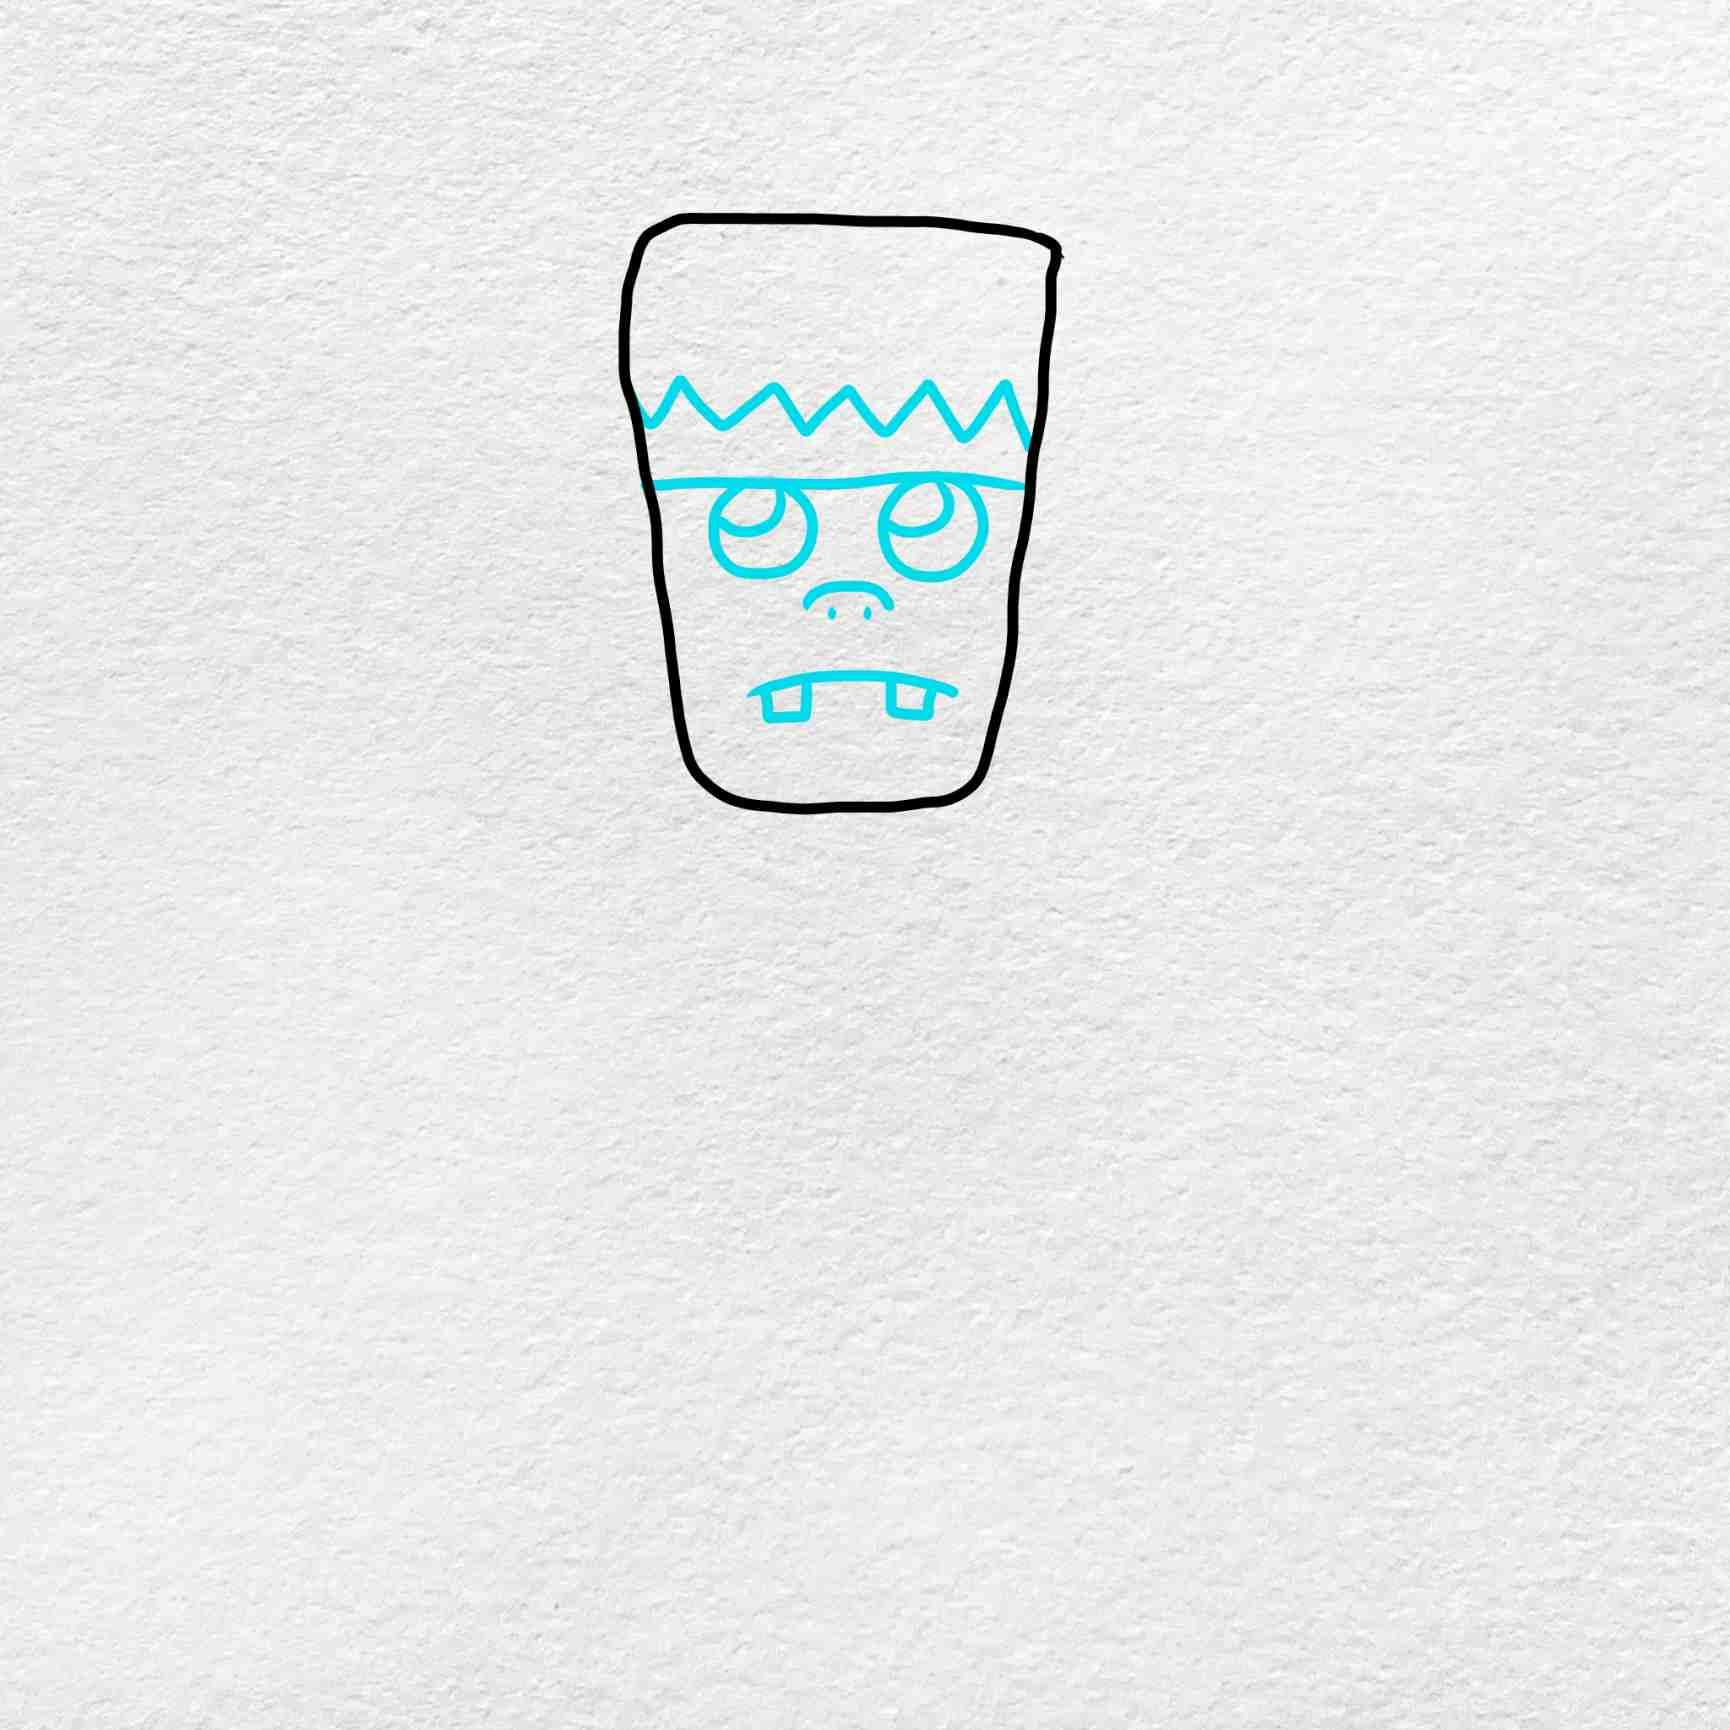 Easy Frankenstein Drawing: Step 2